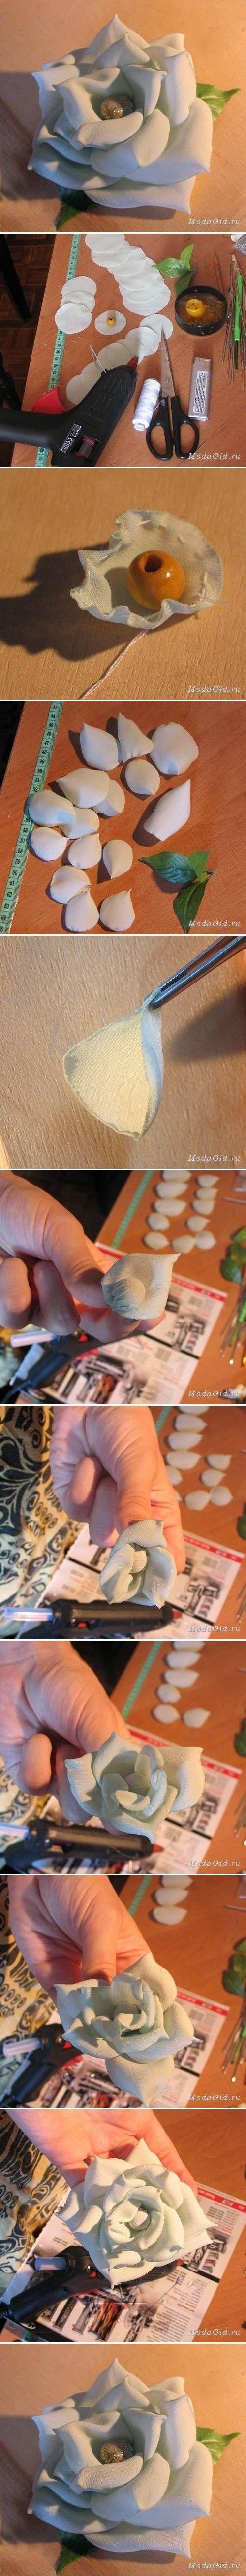 DIY Modular Nylon Rose DIY Projects   UsefulDIY.com Follow Us on Facebook ==> http://www.facebook.com/UsefulDiy